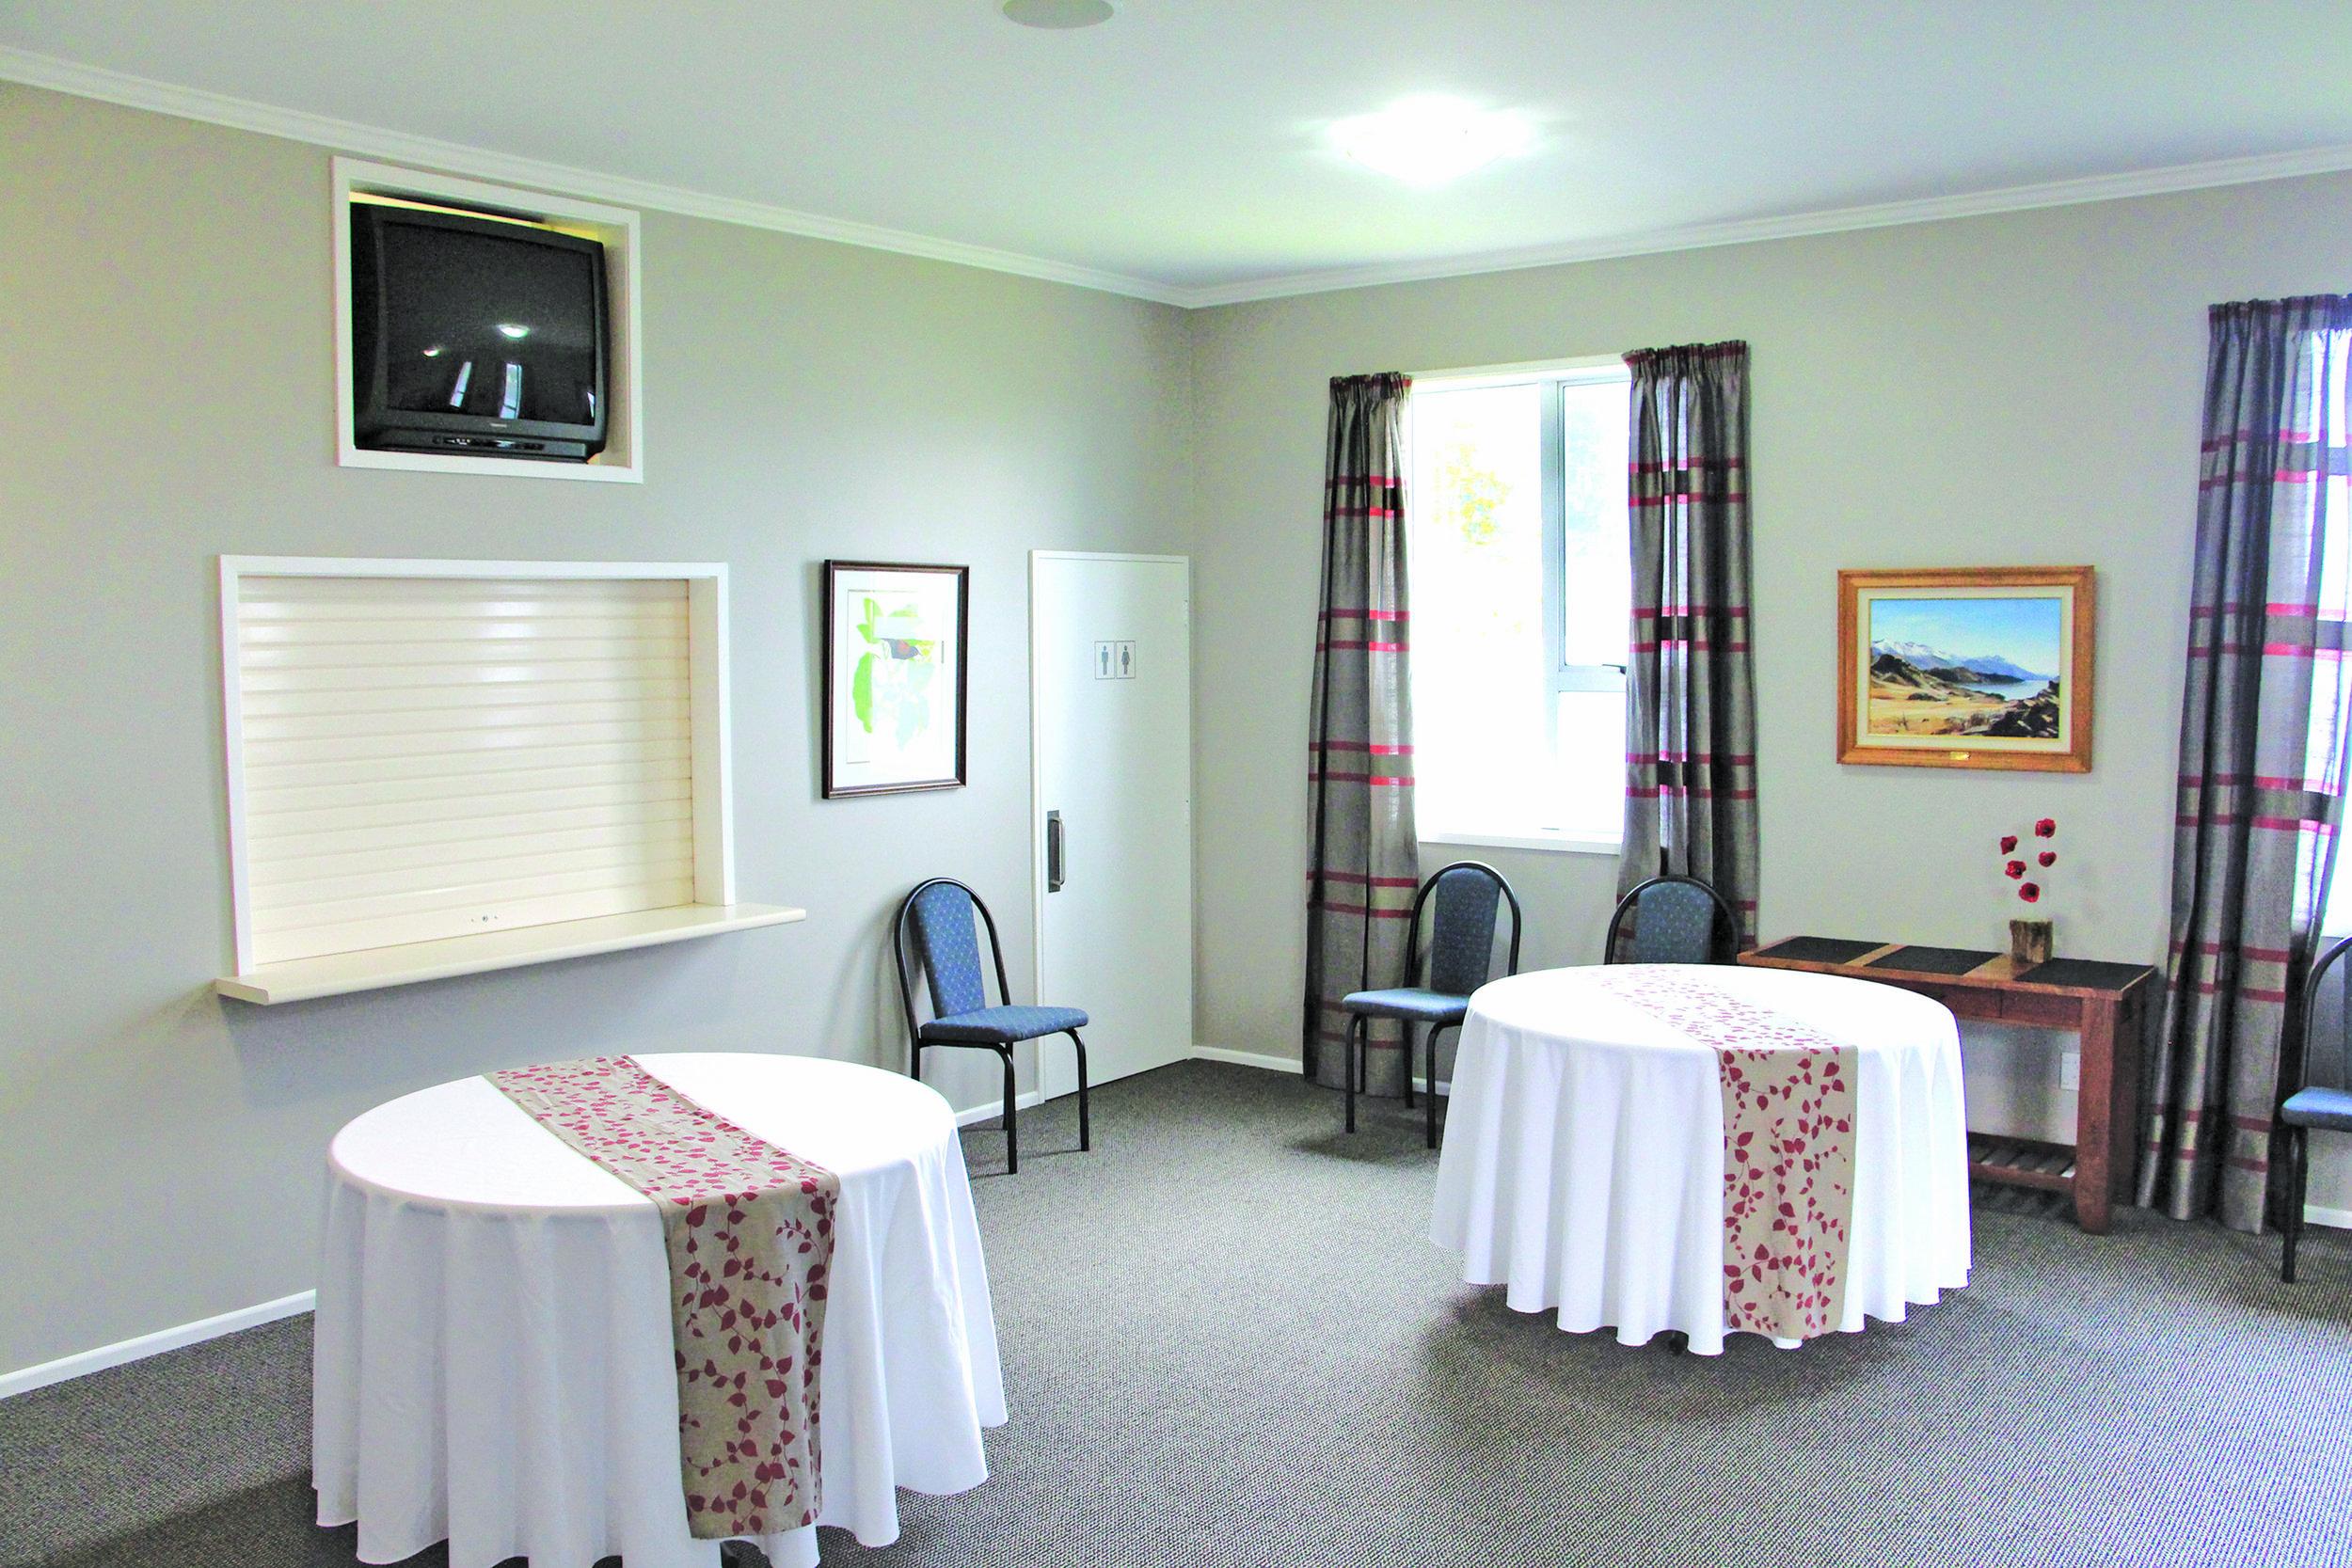 Hilltop Lounge Dunedin  183 Middleton Road Phone:  (03) 455 5074   View on Google Maps